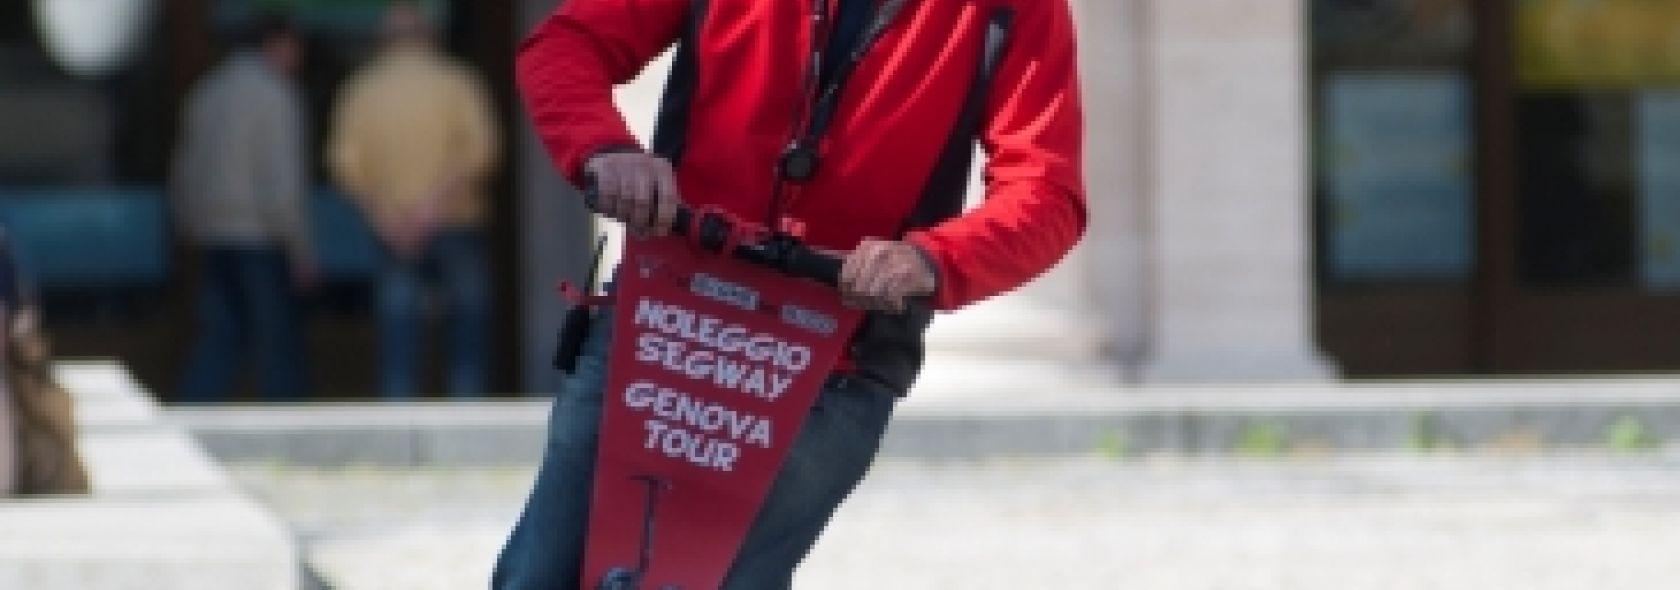 Genova Segway, foto da www.genovasegway.it